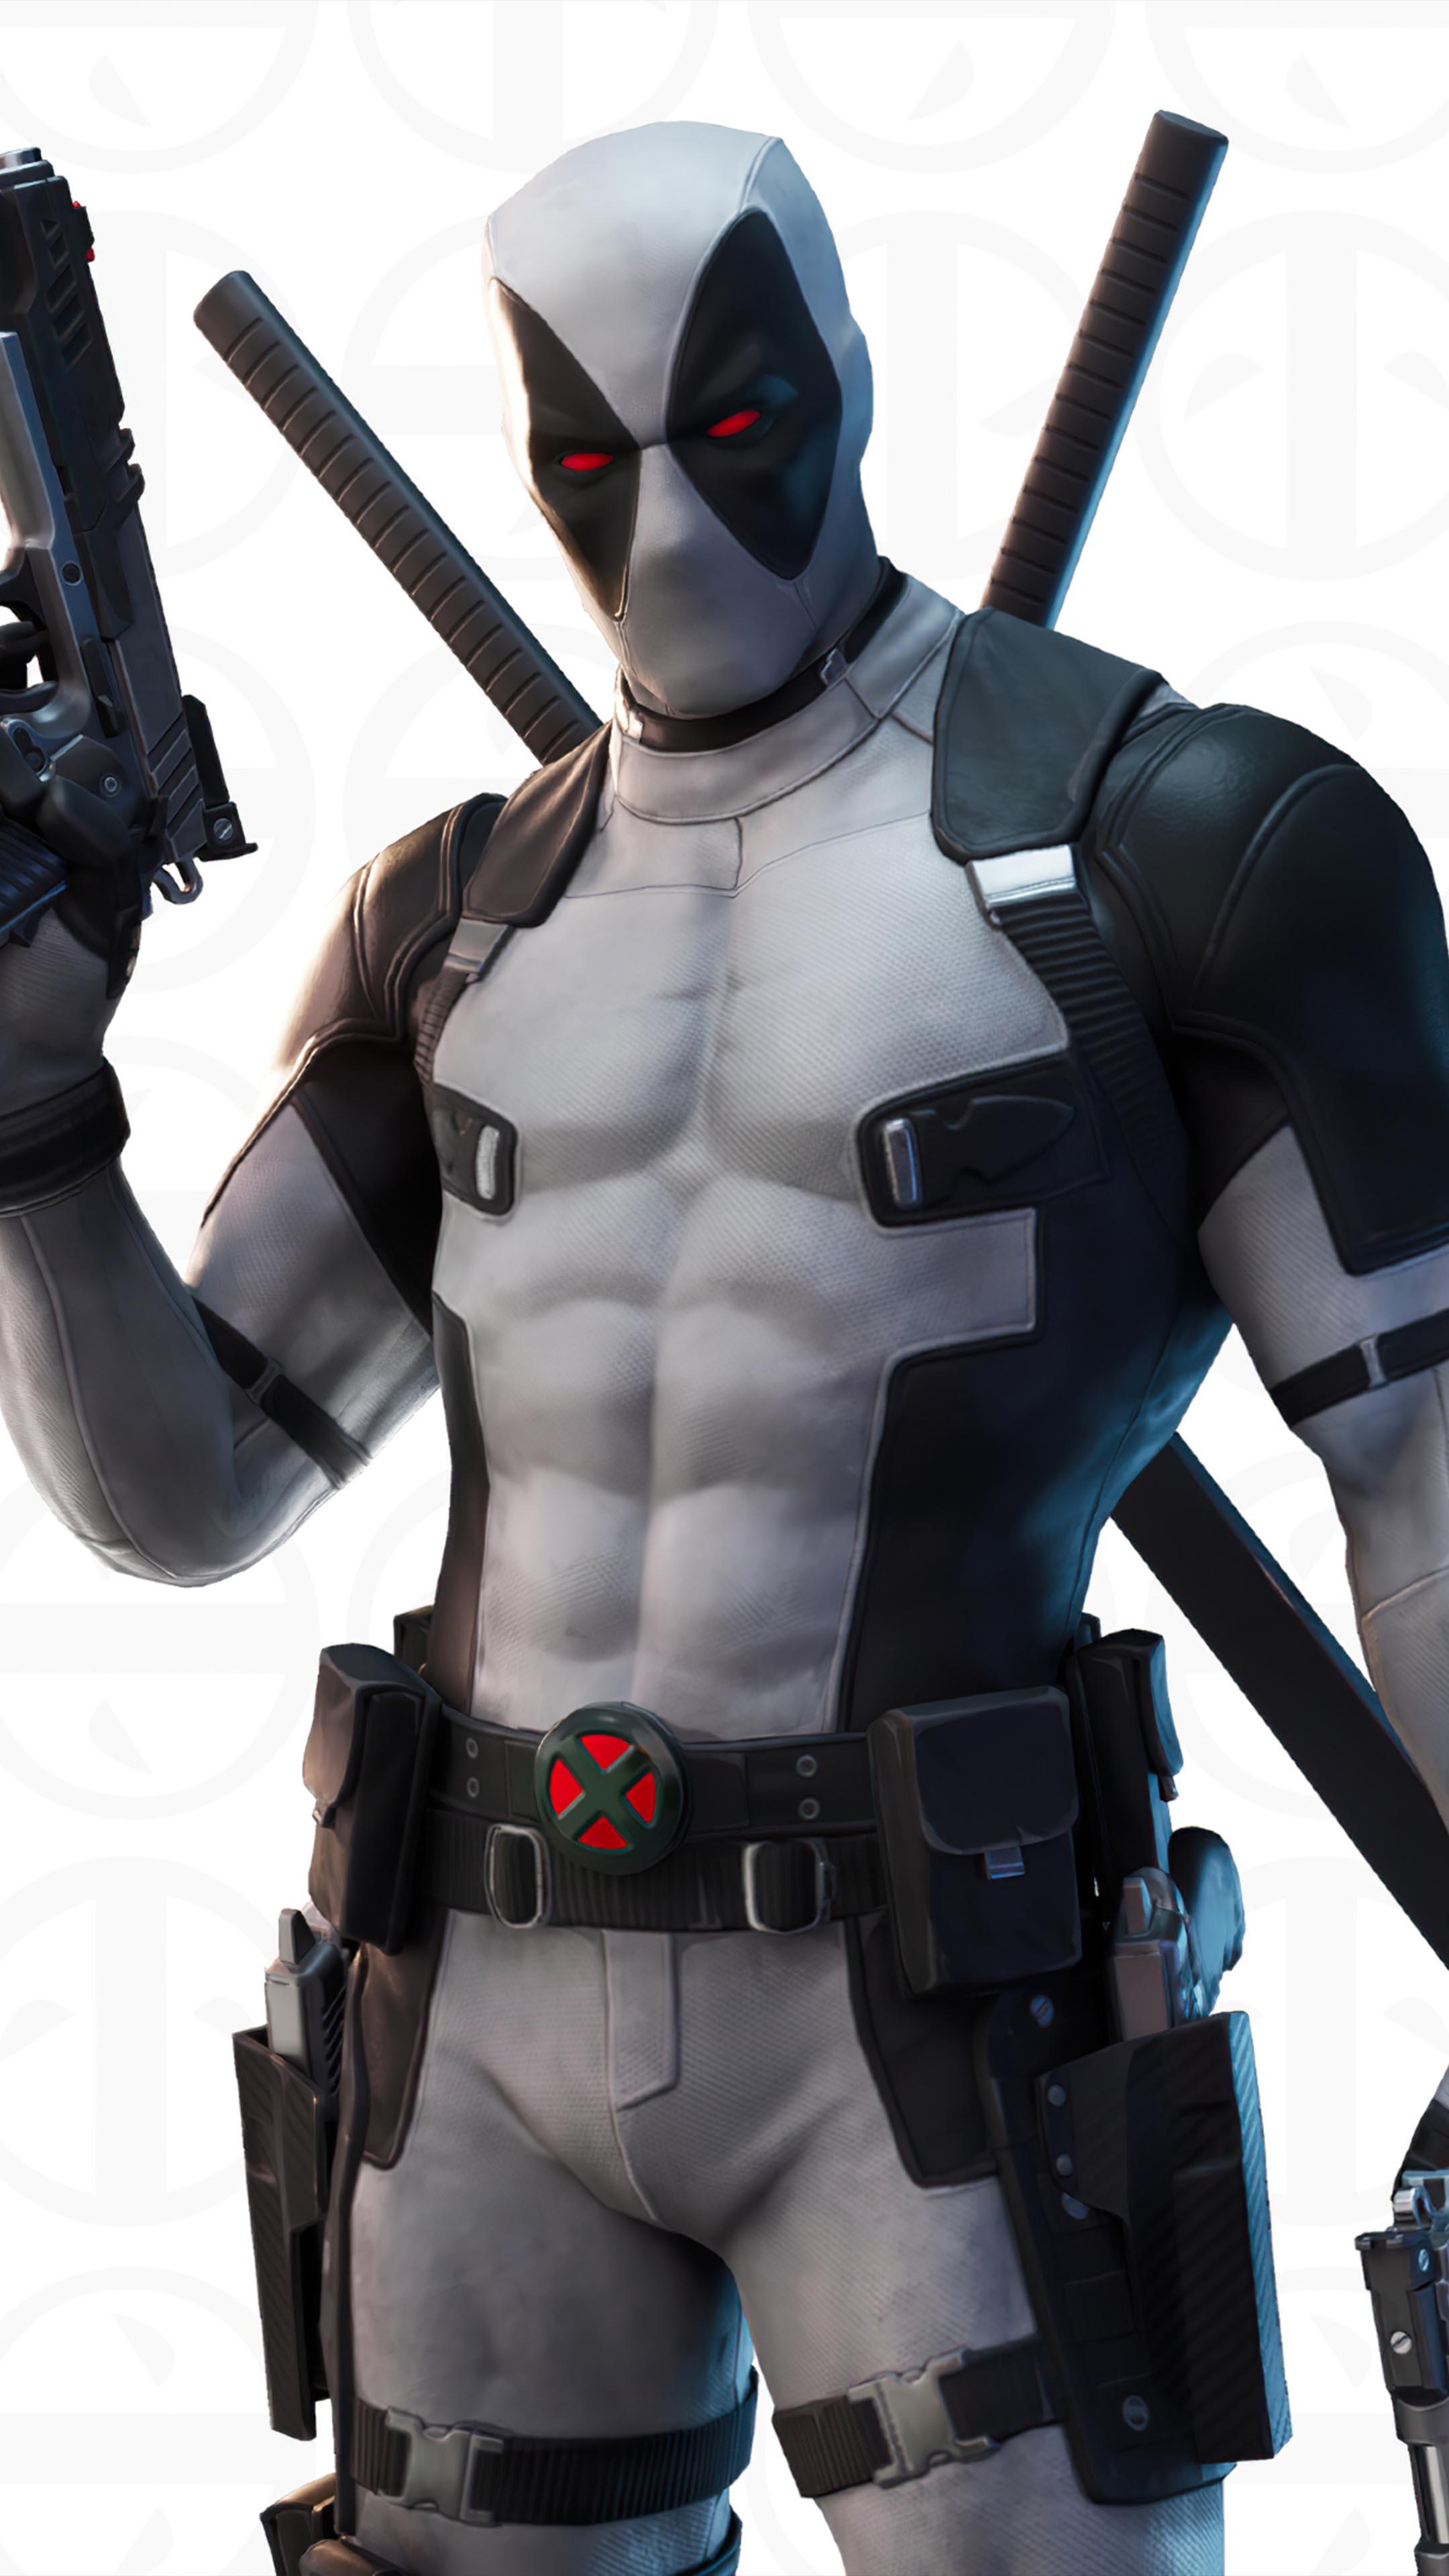 Deadpool X Force Fortnite 4k Ultra Hd Mobile Wallpaper